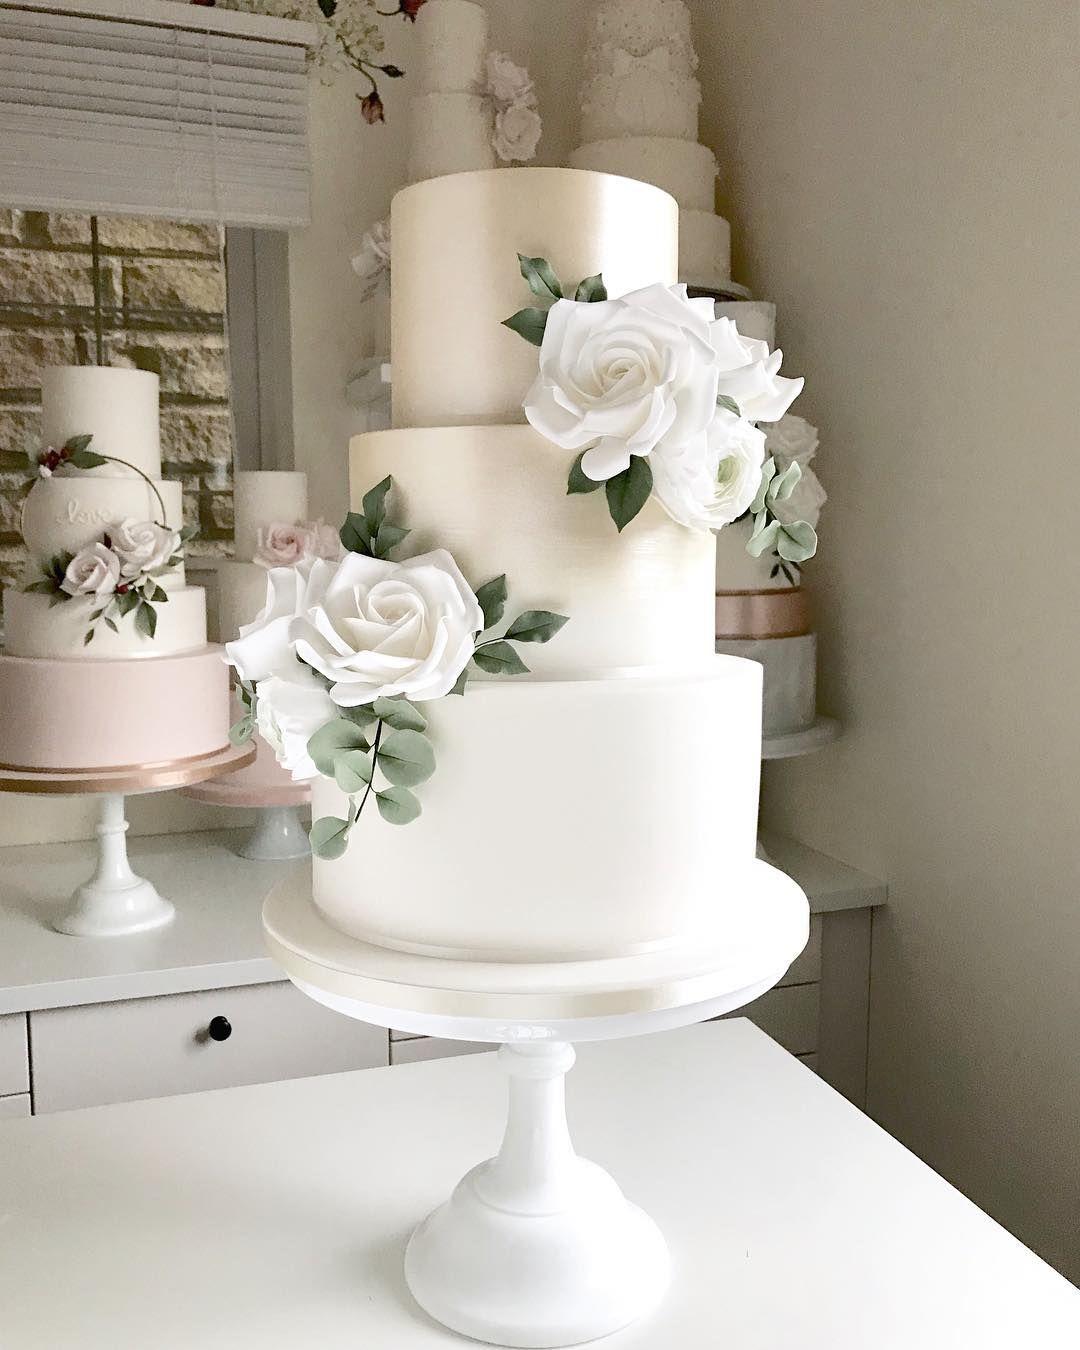 210 3 Tier Cakes Ideas In 2021 Beautiful Cakes Cupcake Cakes Wedding Cakes